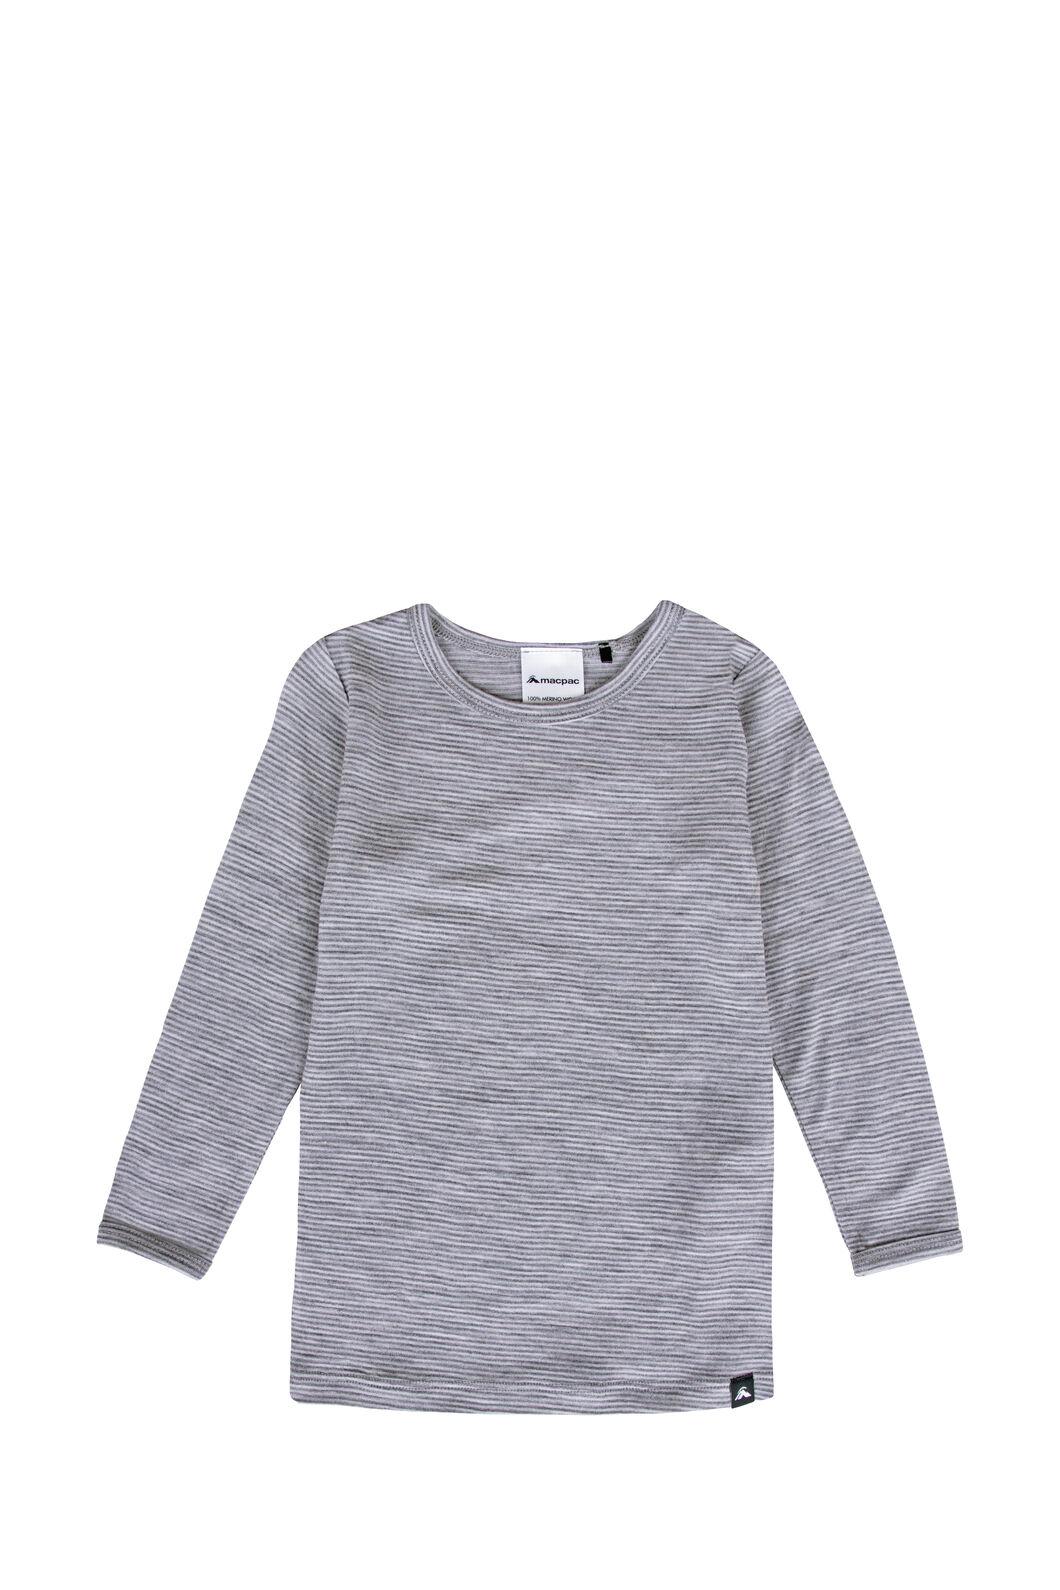 Macpac Baby 150 Merino Long Sleeve Top, Light Grey Stripe, hi-res